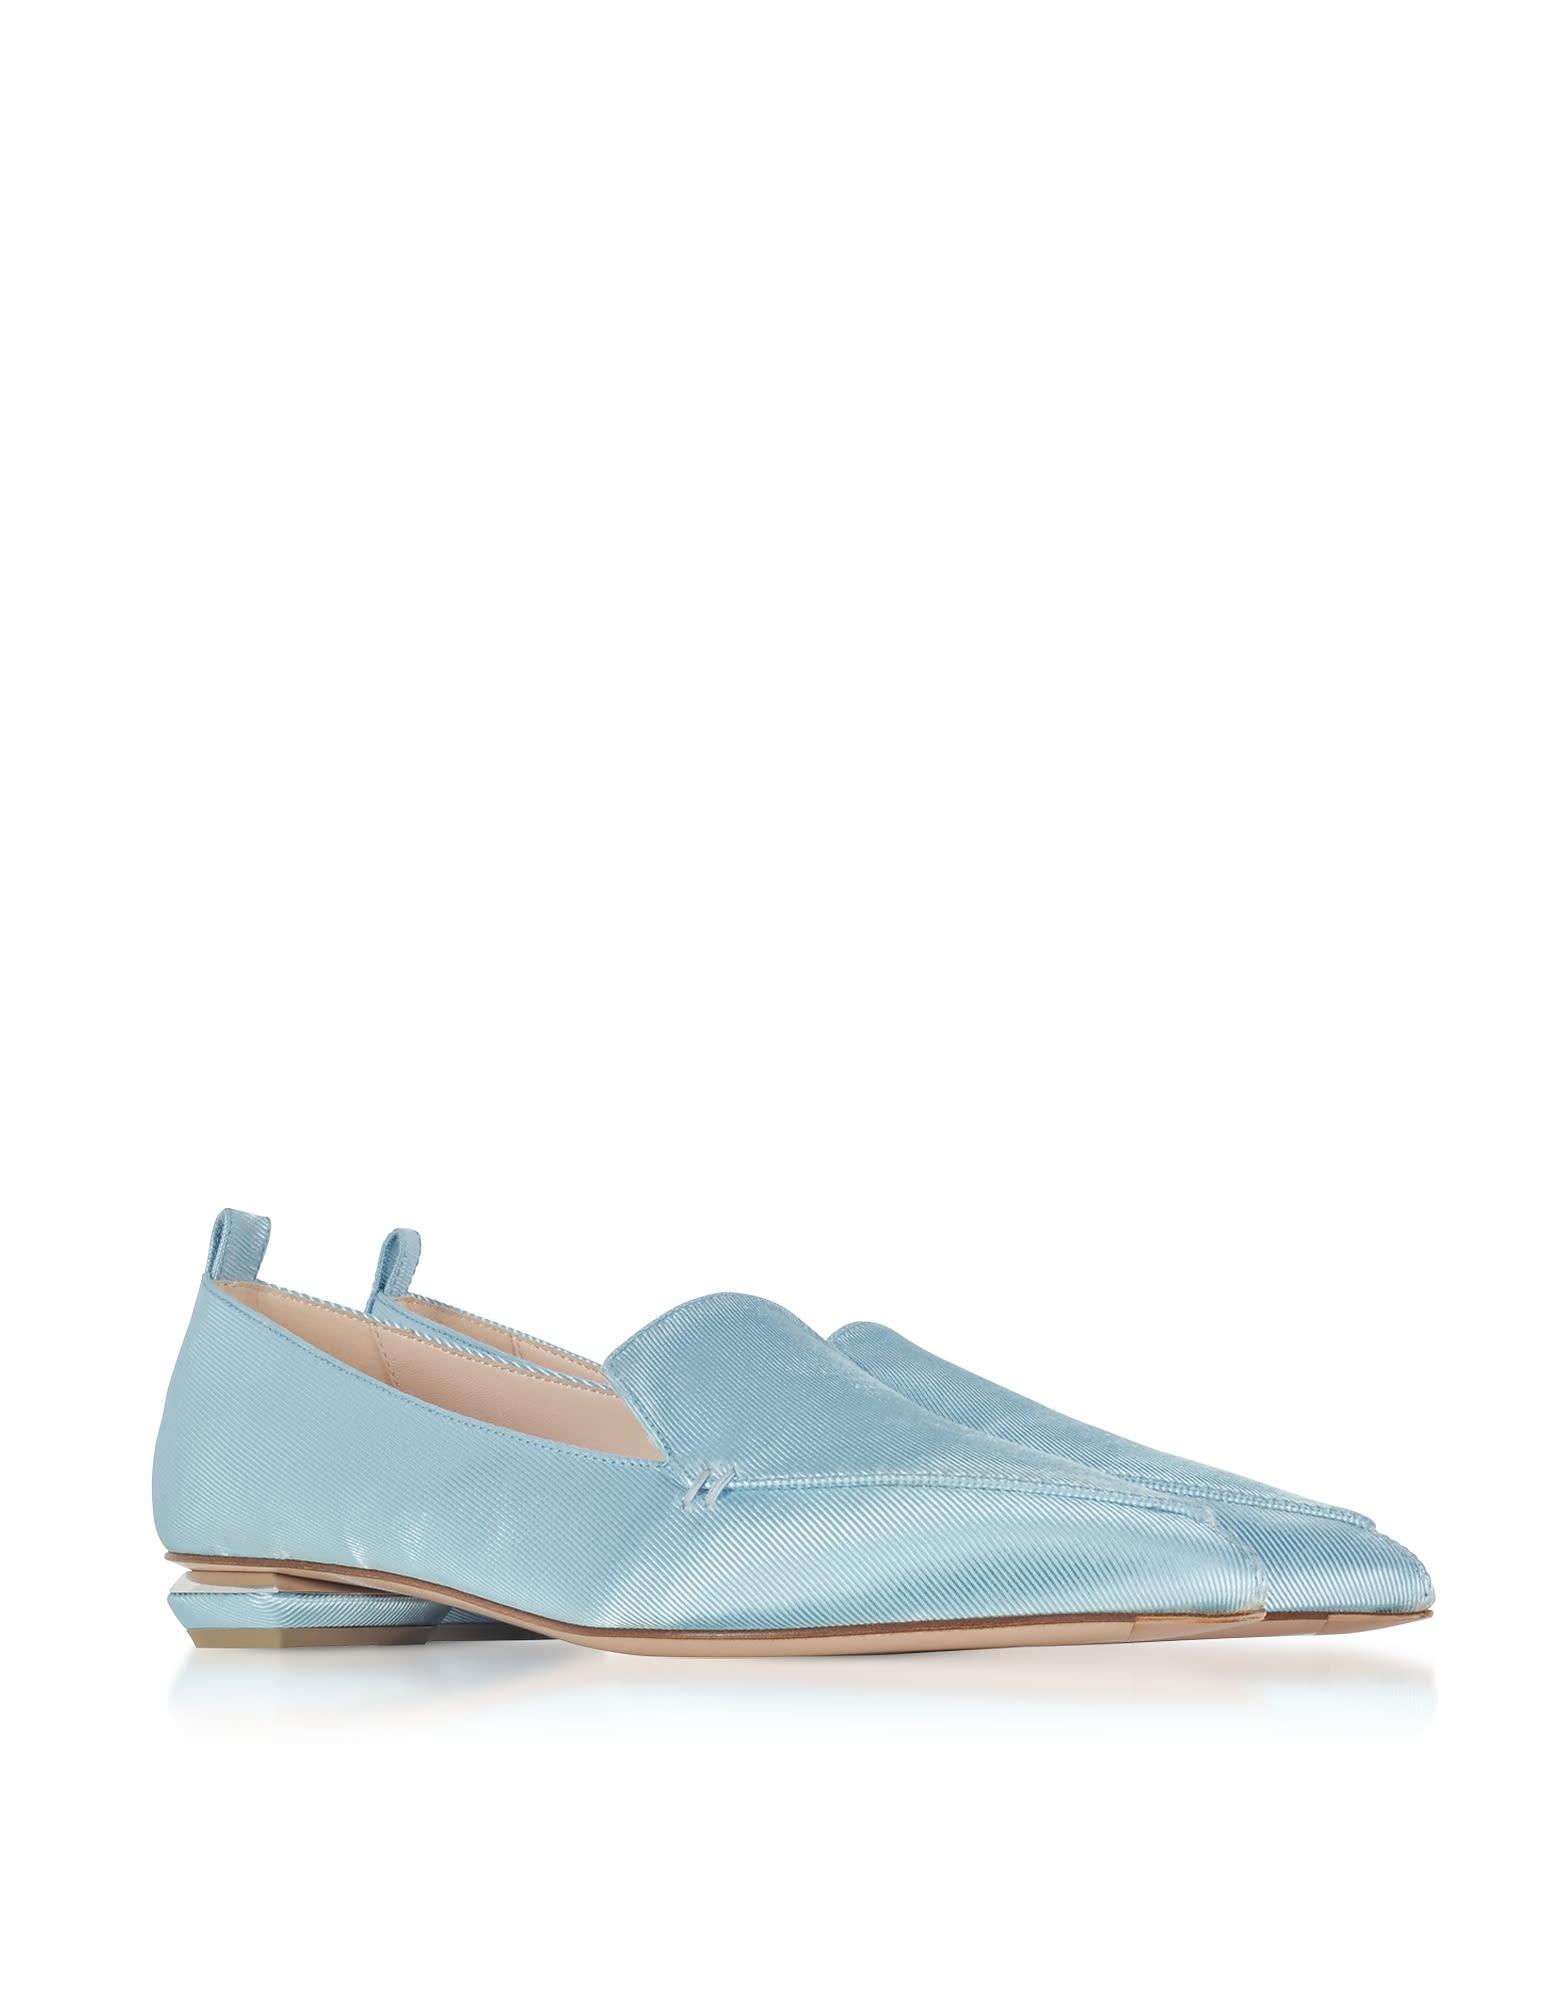 Nicholas Kirkwood Designer Shoes, Platinum Satin Beya Loafers